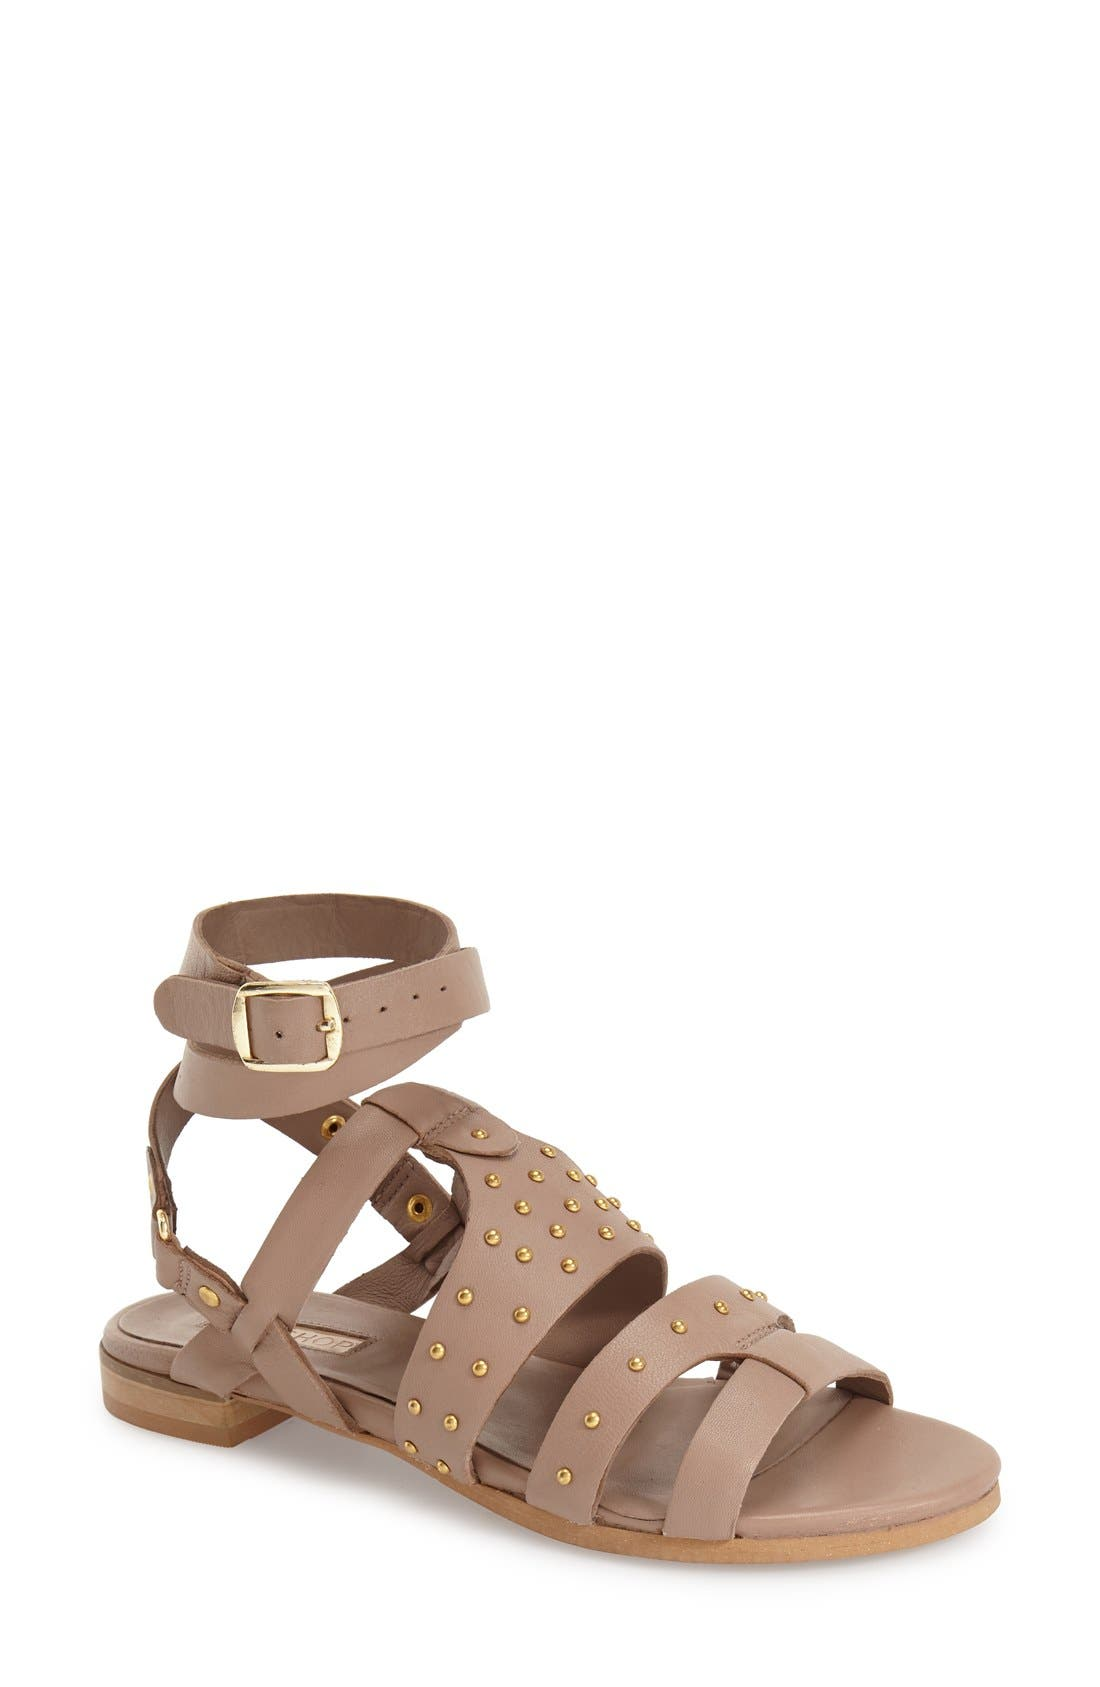 Main Image - Topshop 'Flame' Stud Wraparound Ankle Strap Sandal (Women)